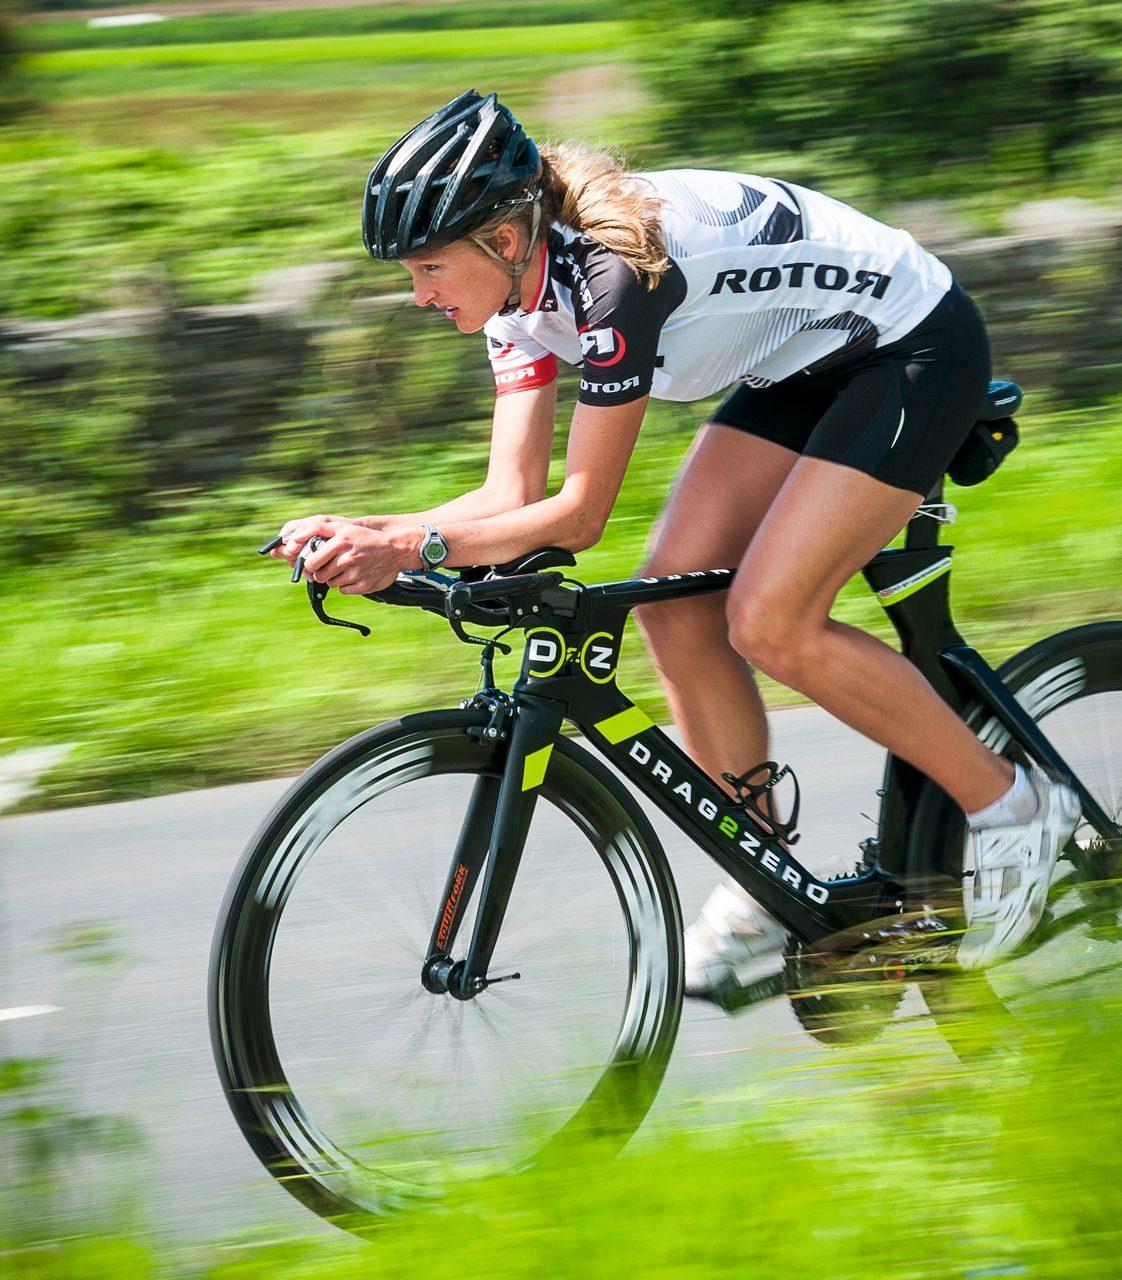 Female triathlete in bike training